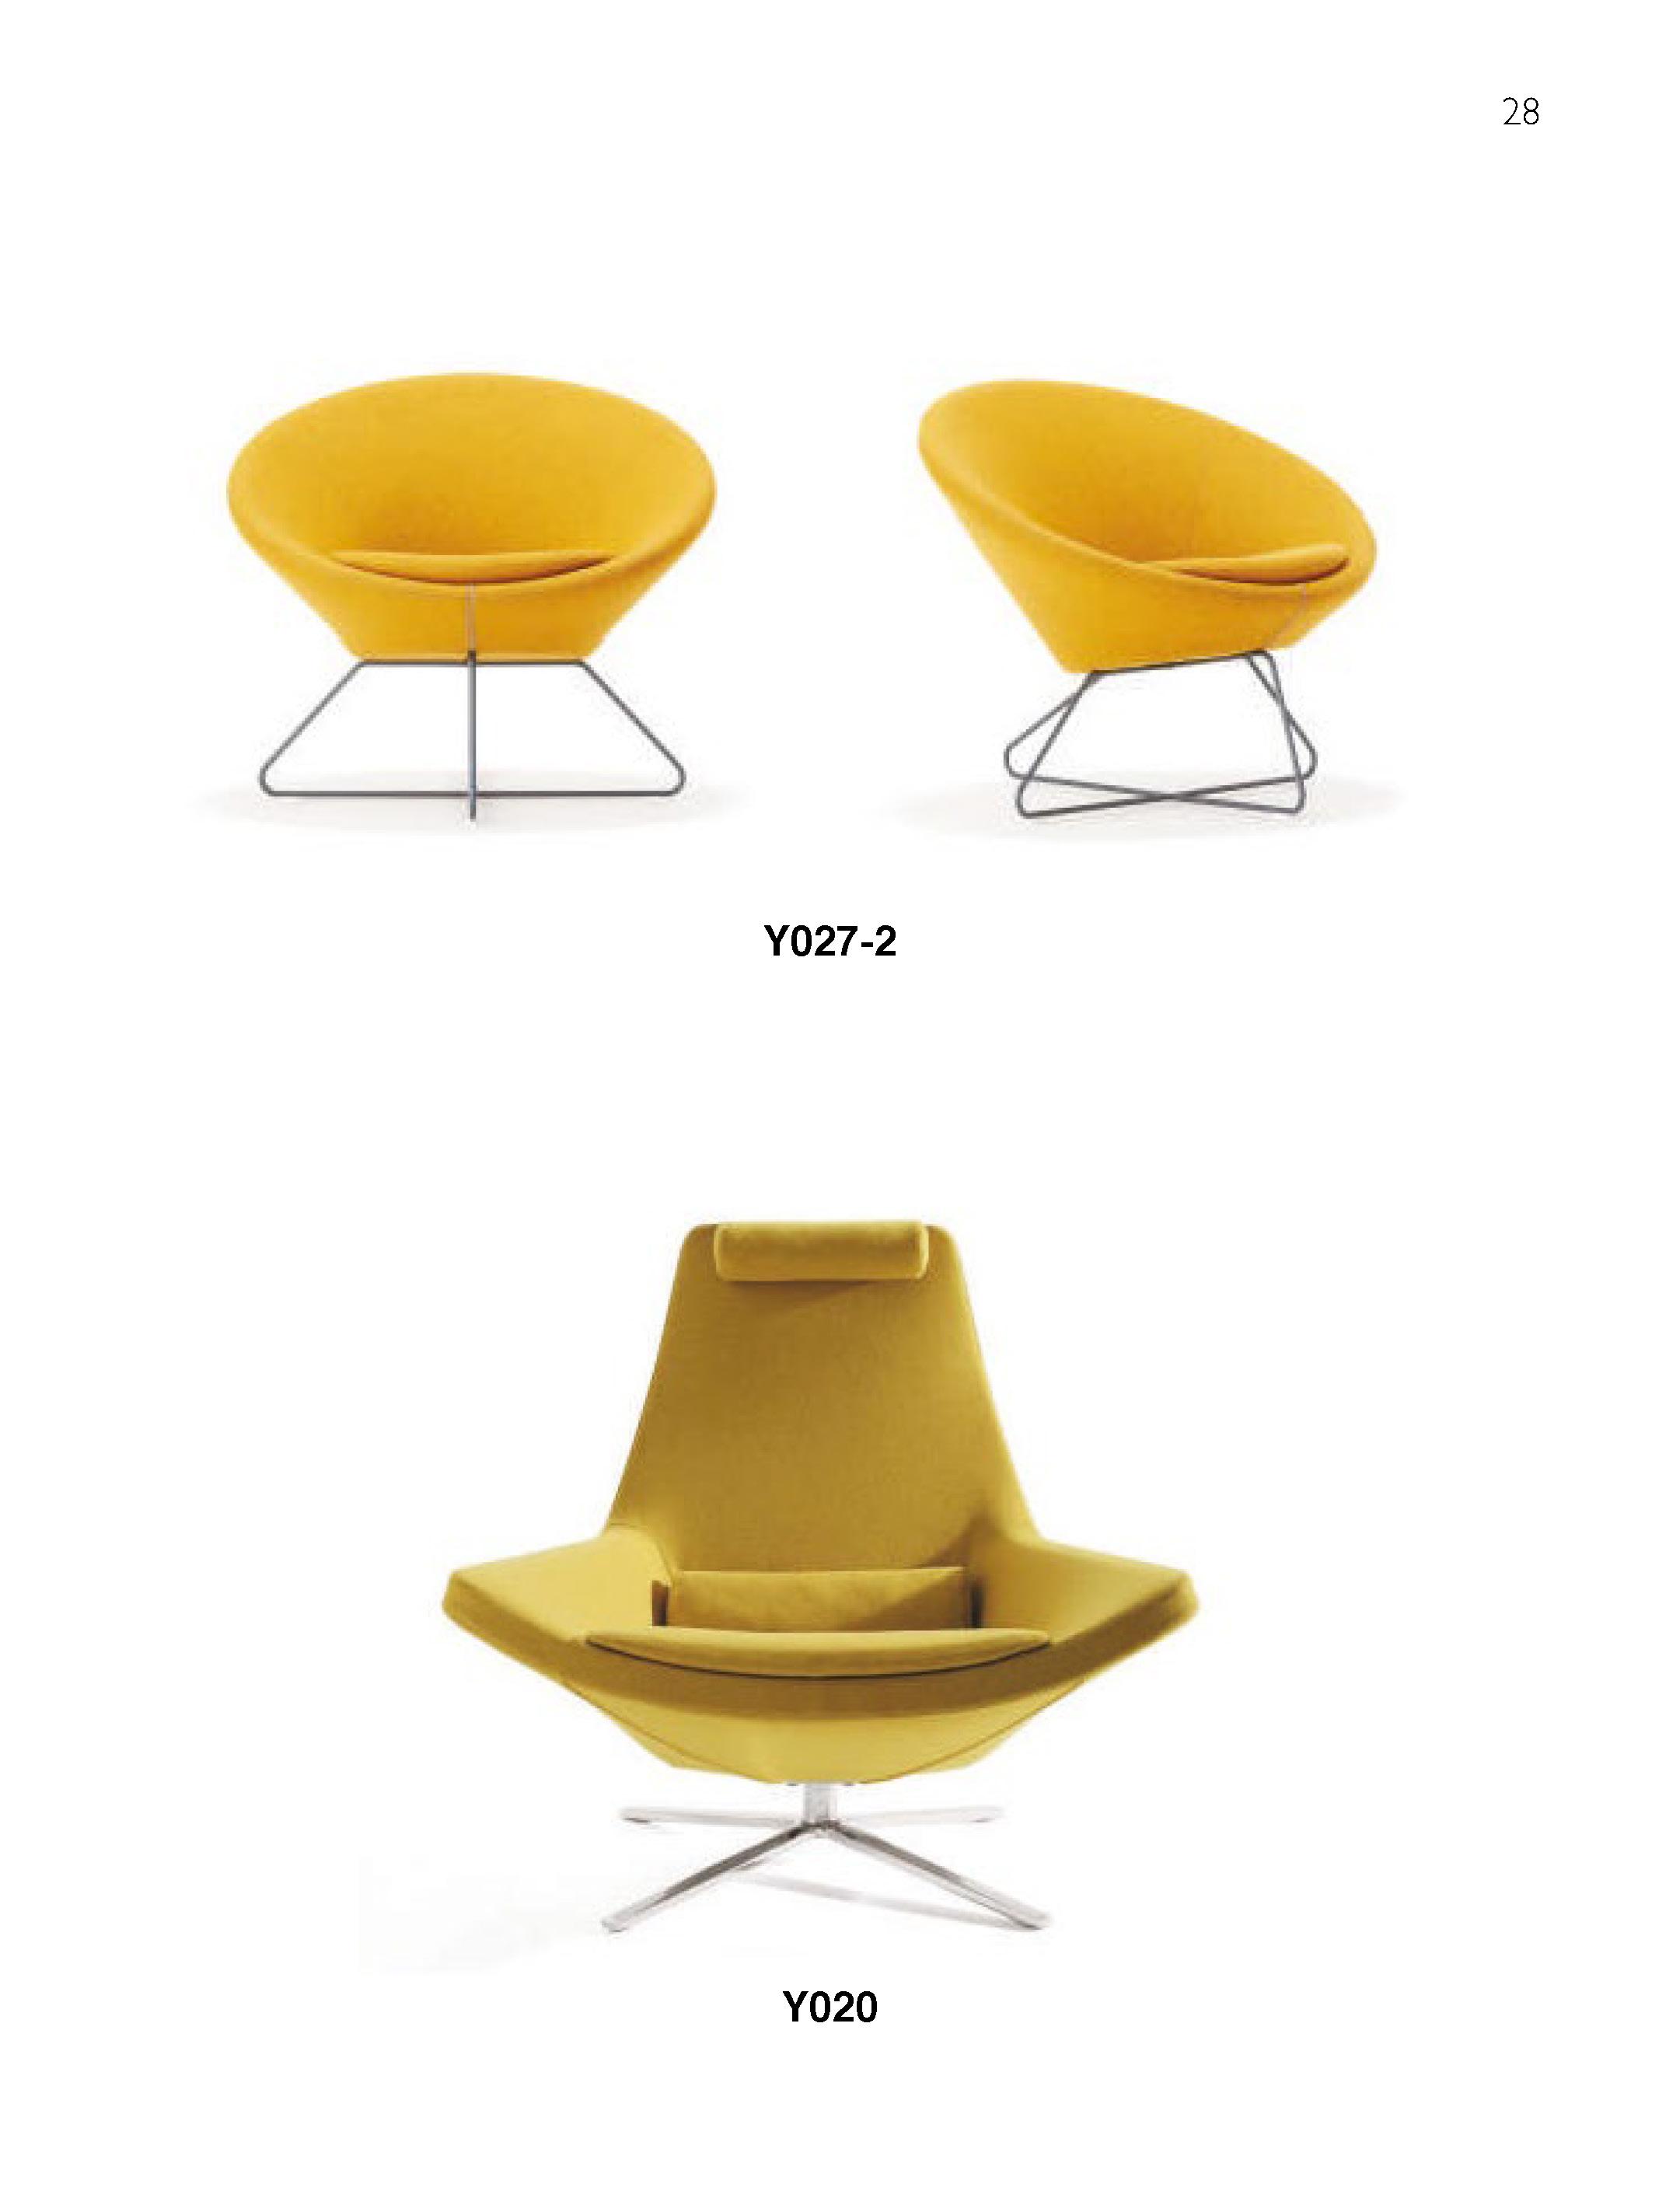 Top Furniture Catalog 2019_Page_28.jpg